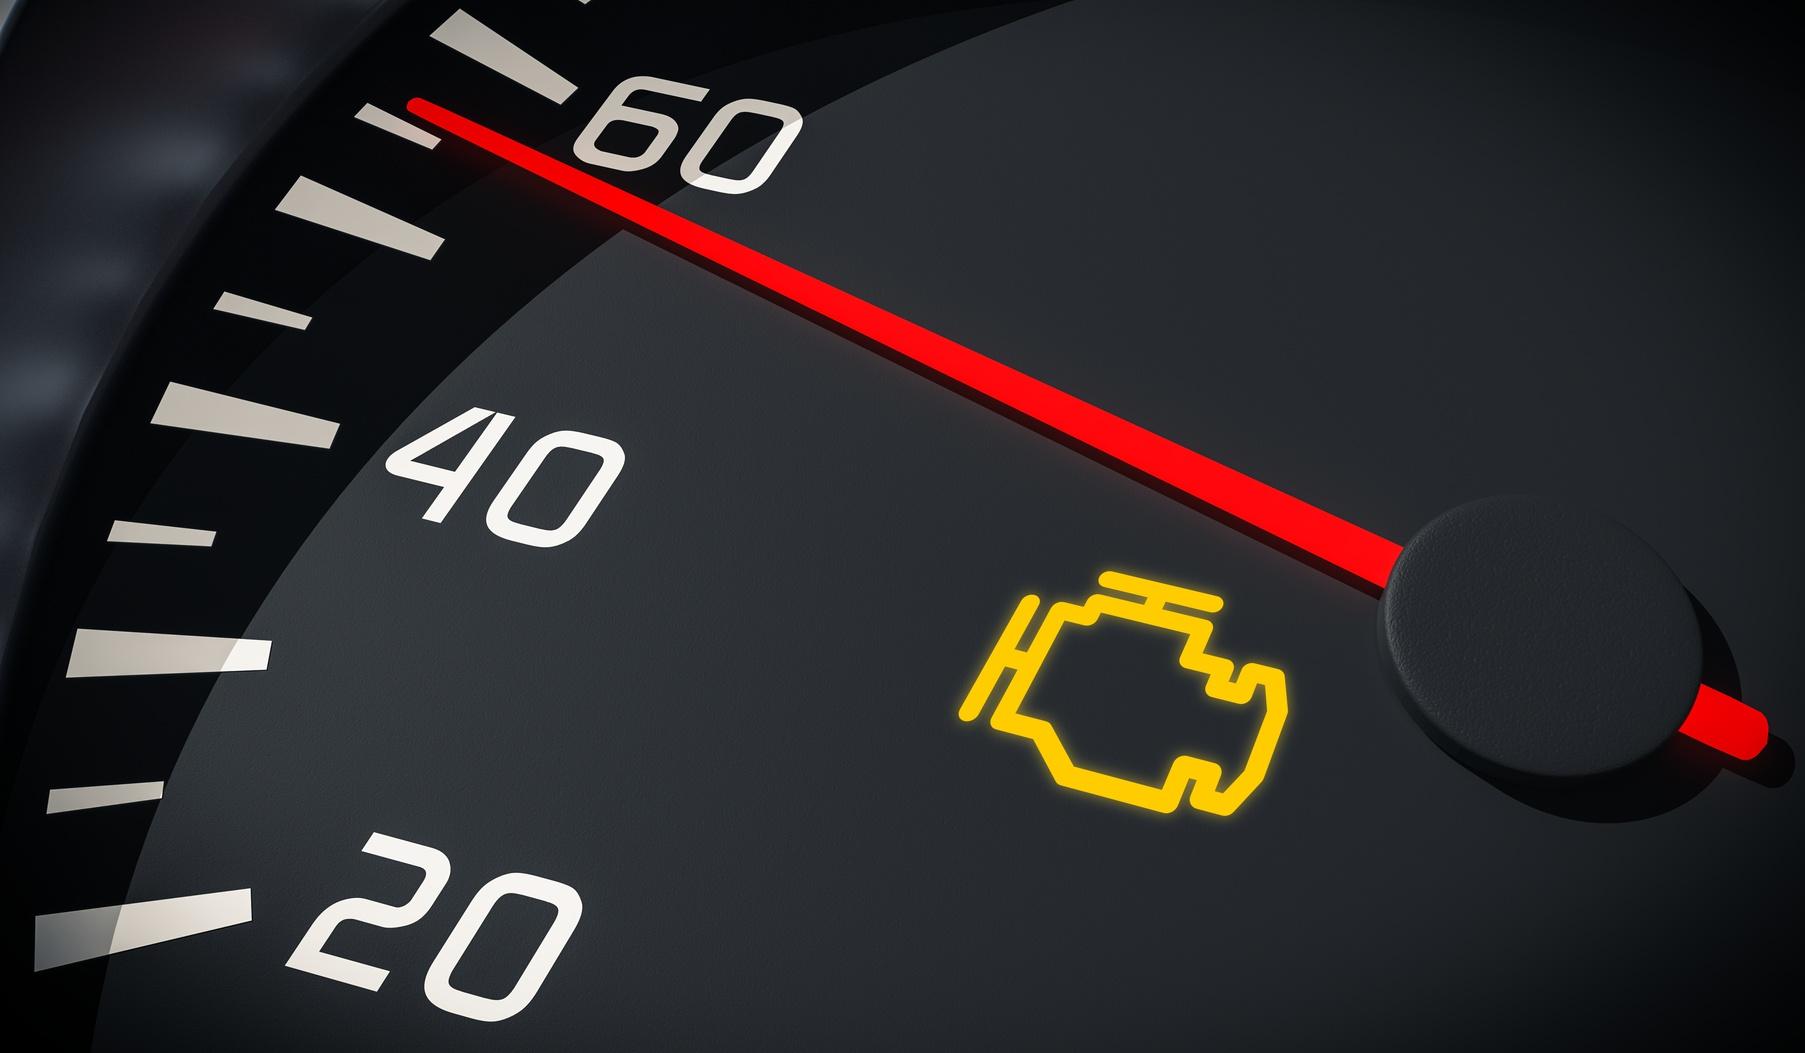 Engine Malfunction Warning Light Control In Car Dashboard 3d